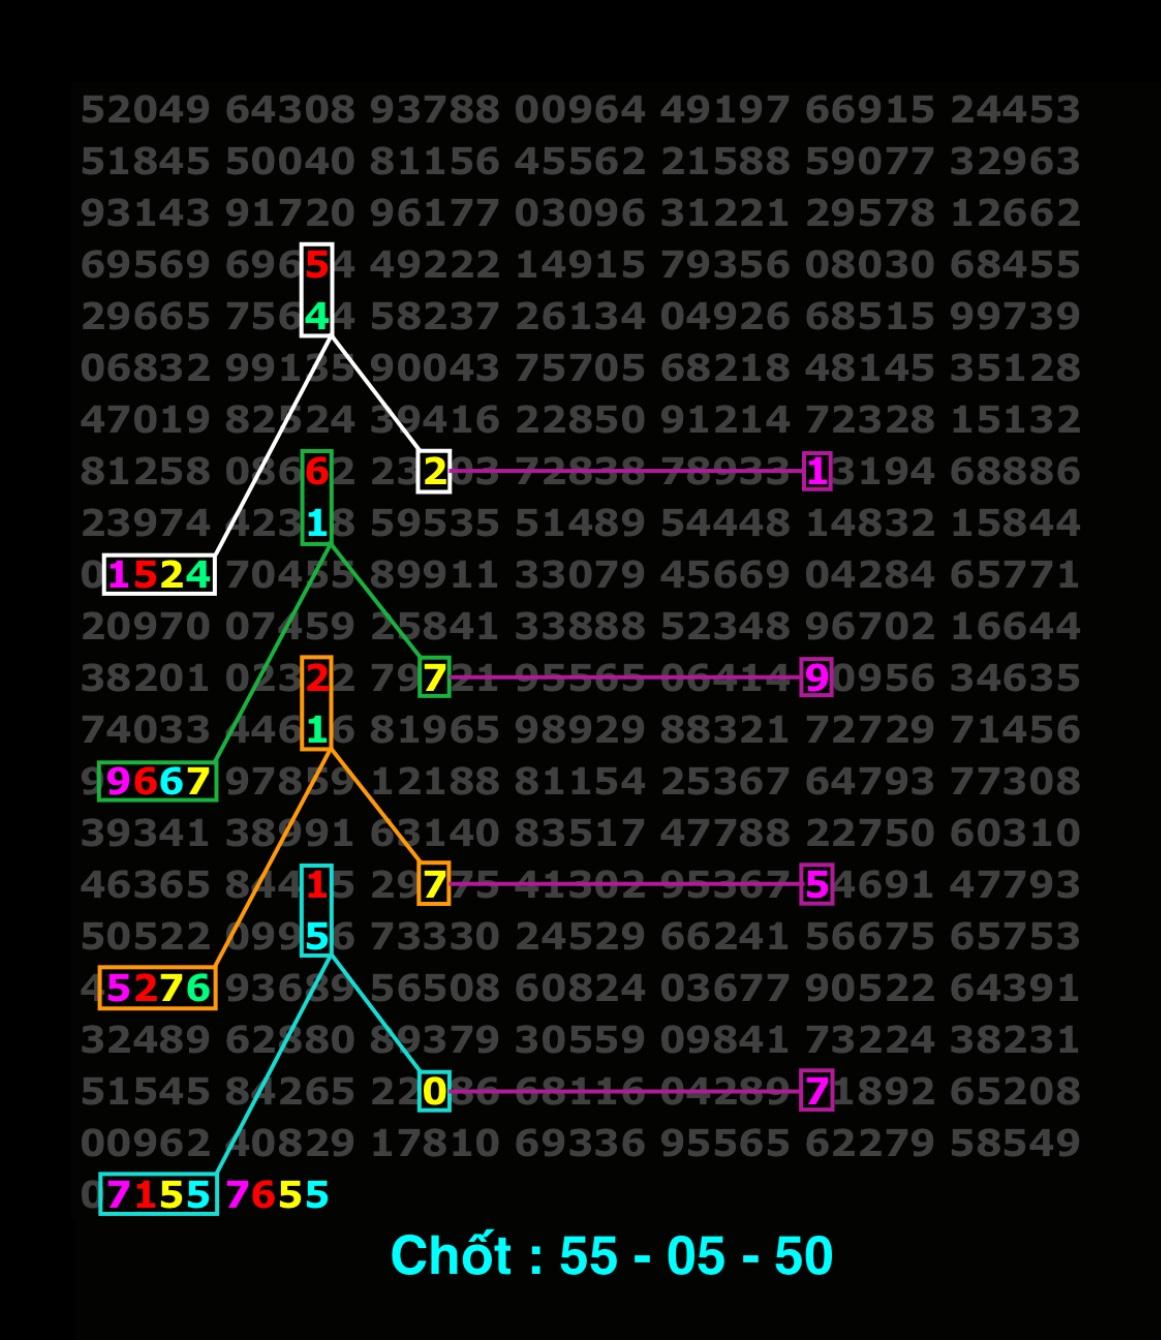 AE43CD3B-3AE8-4F4C-8F66-4A8D451BB3AC.jpeg